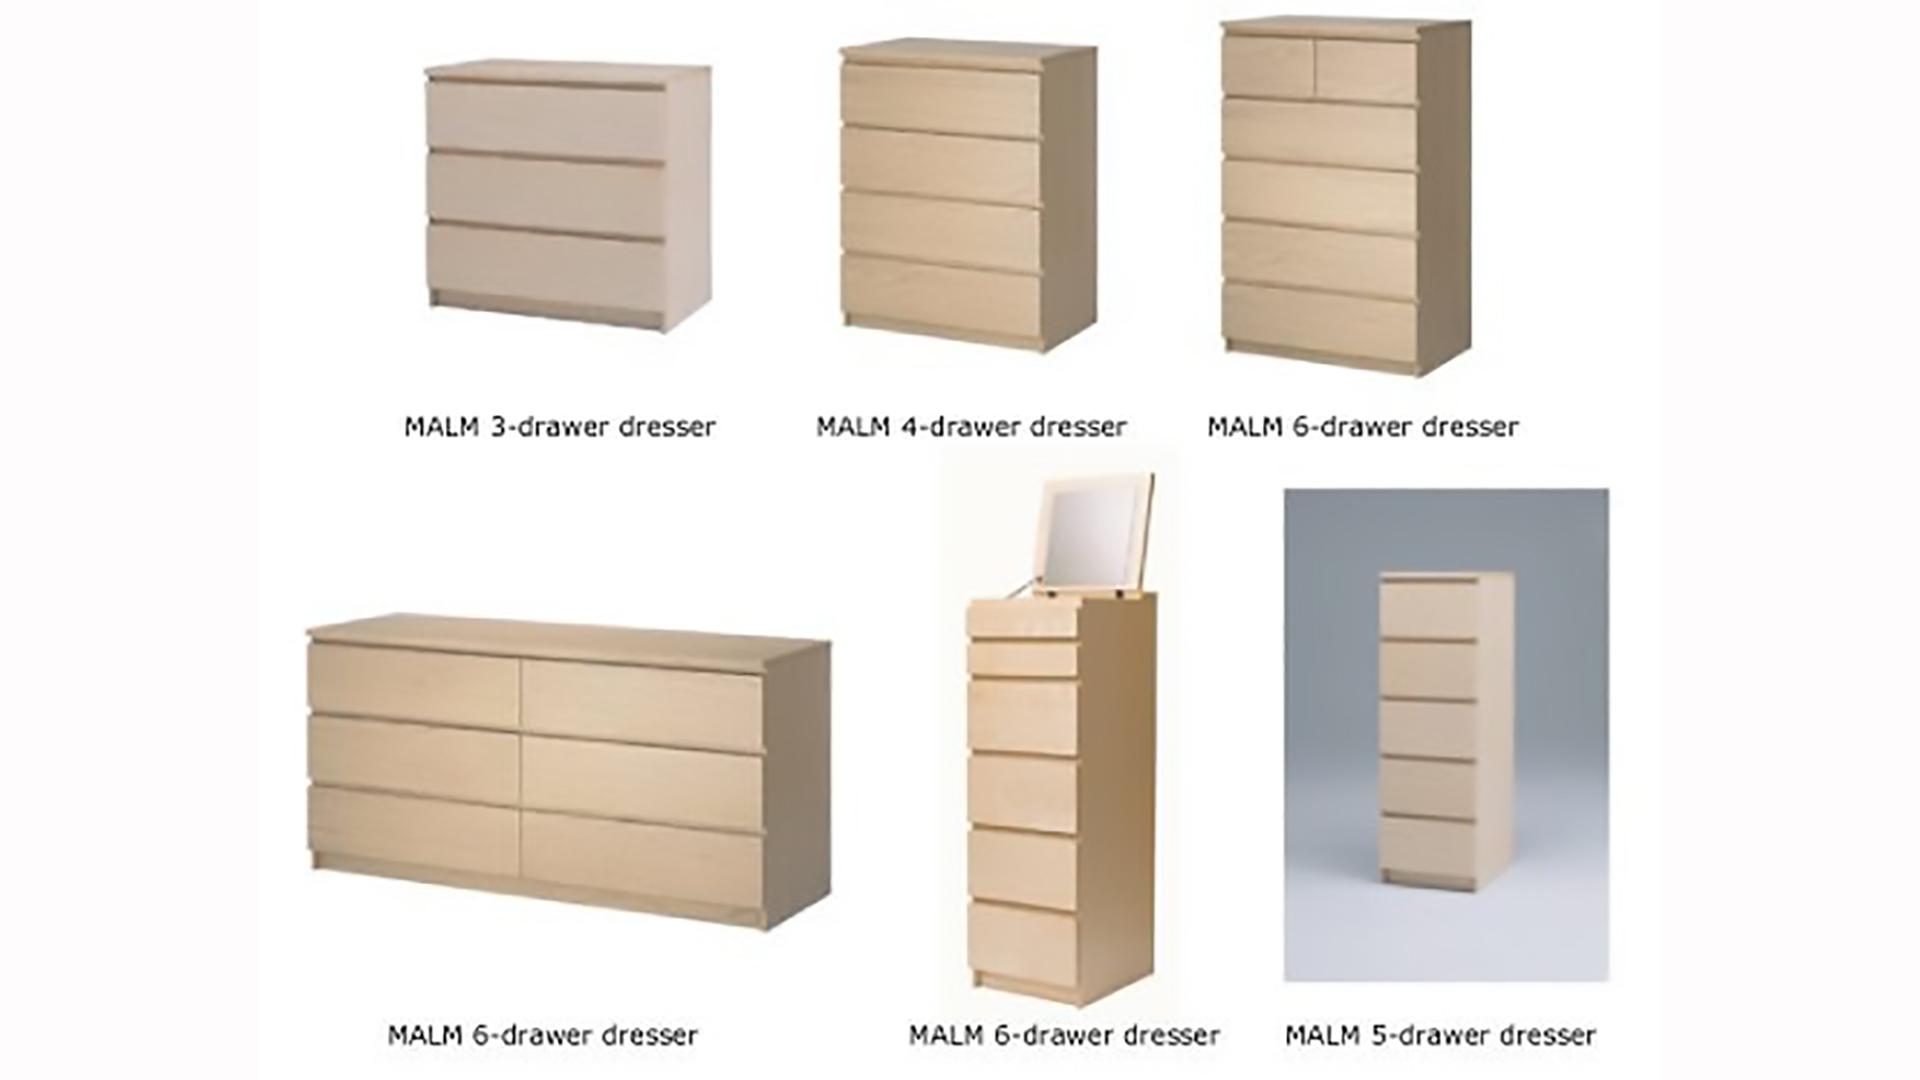 IKEA Malm dresser recalled-159532.jpg38718303